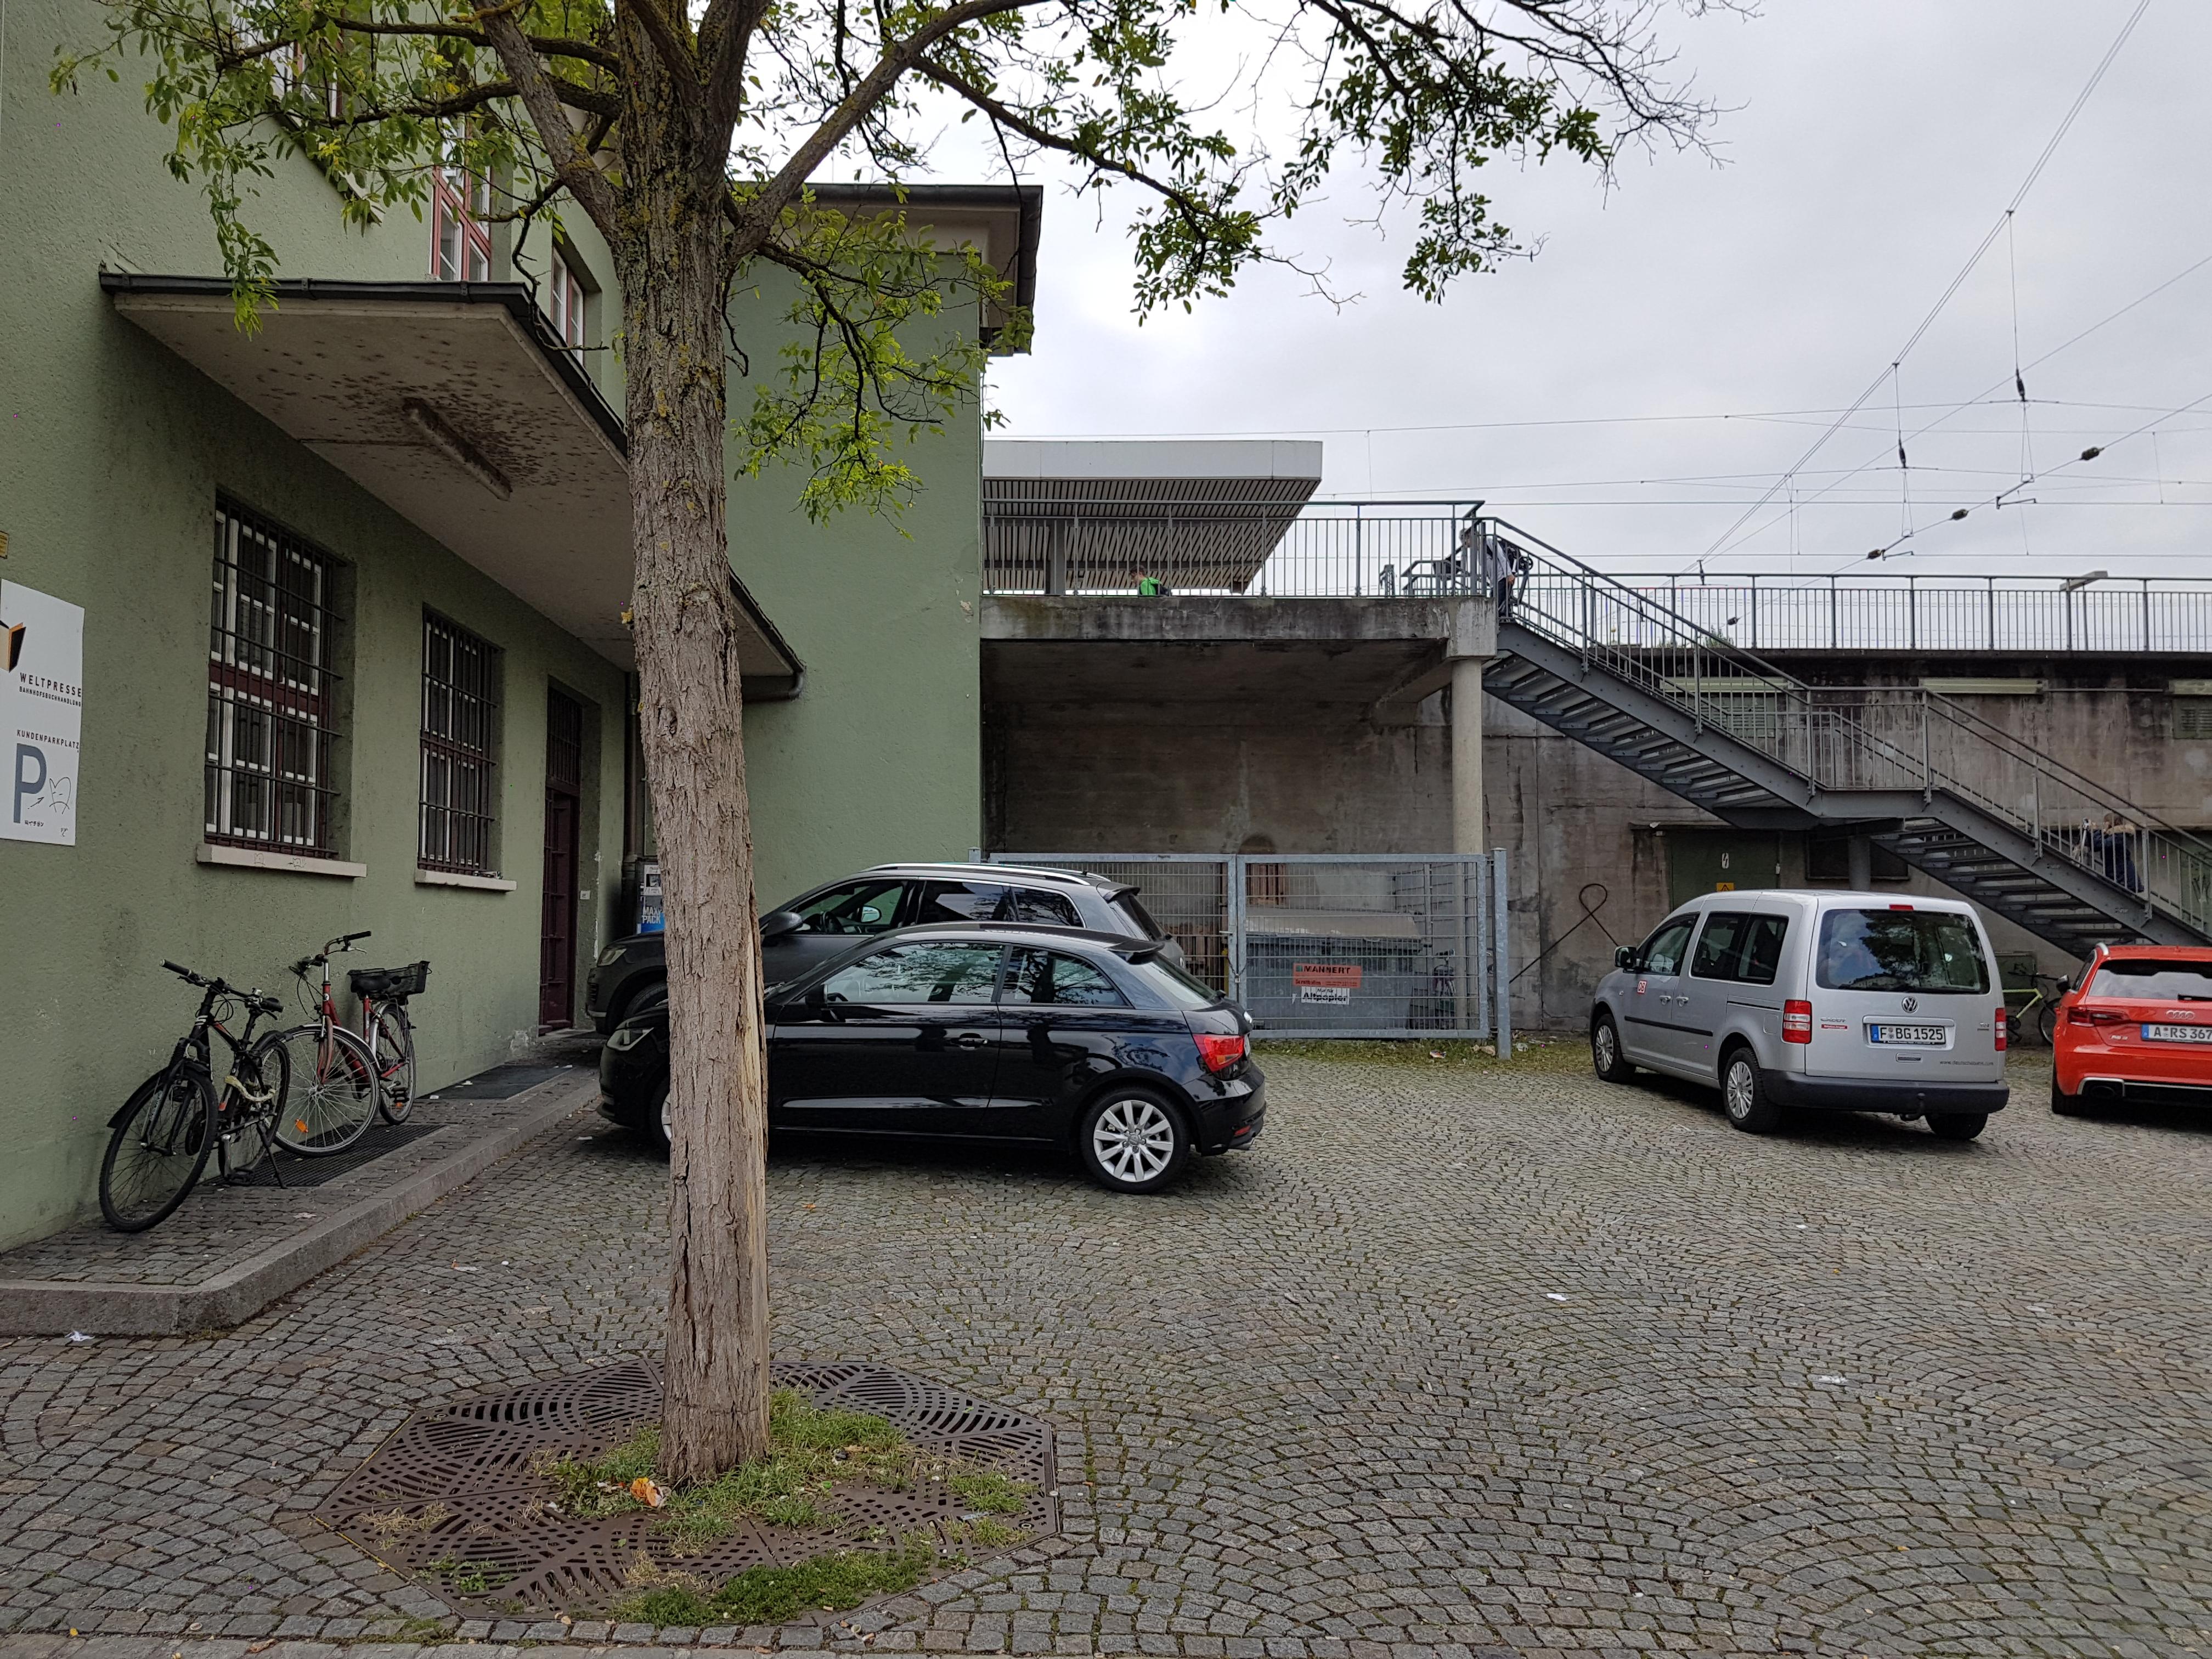 Bild 2 - separater Treppenzugang